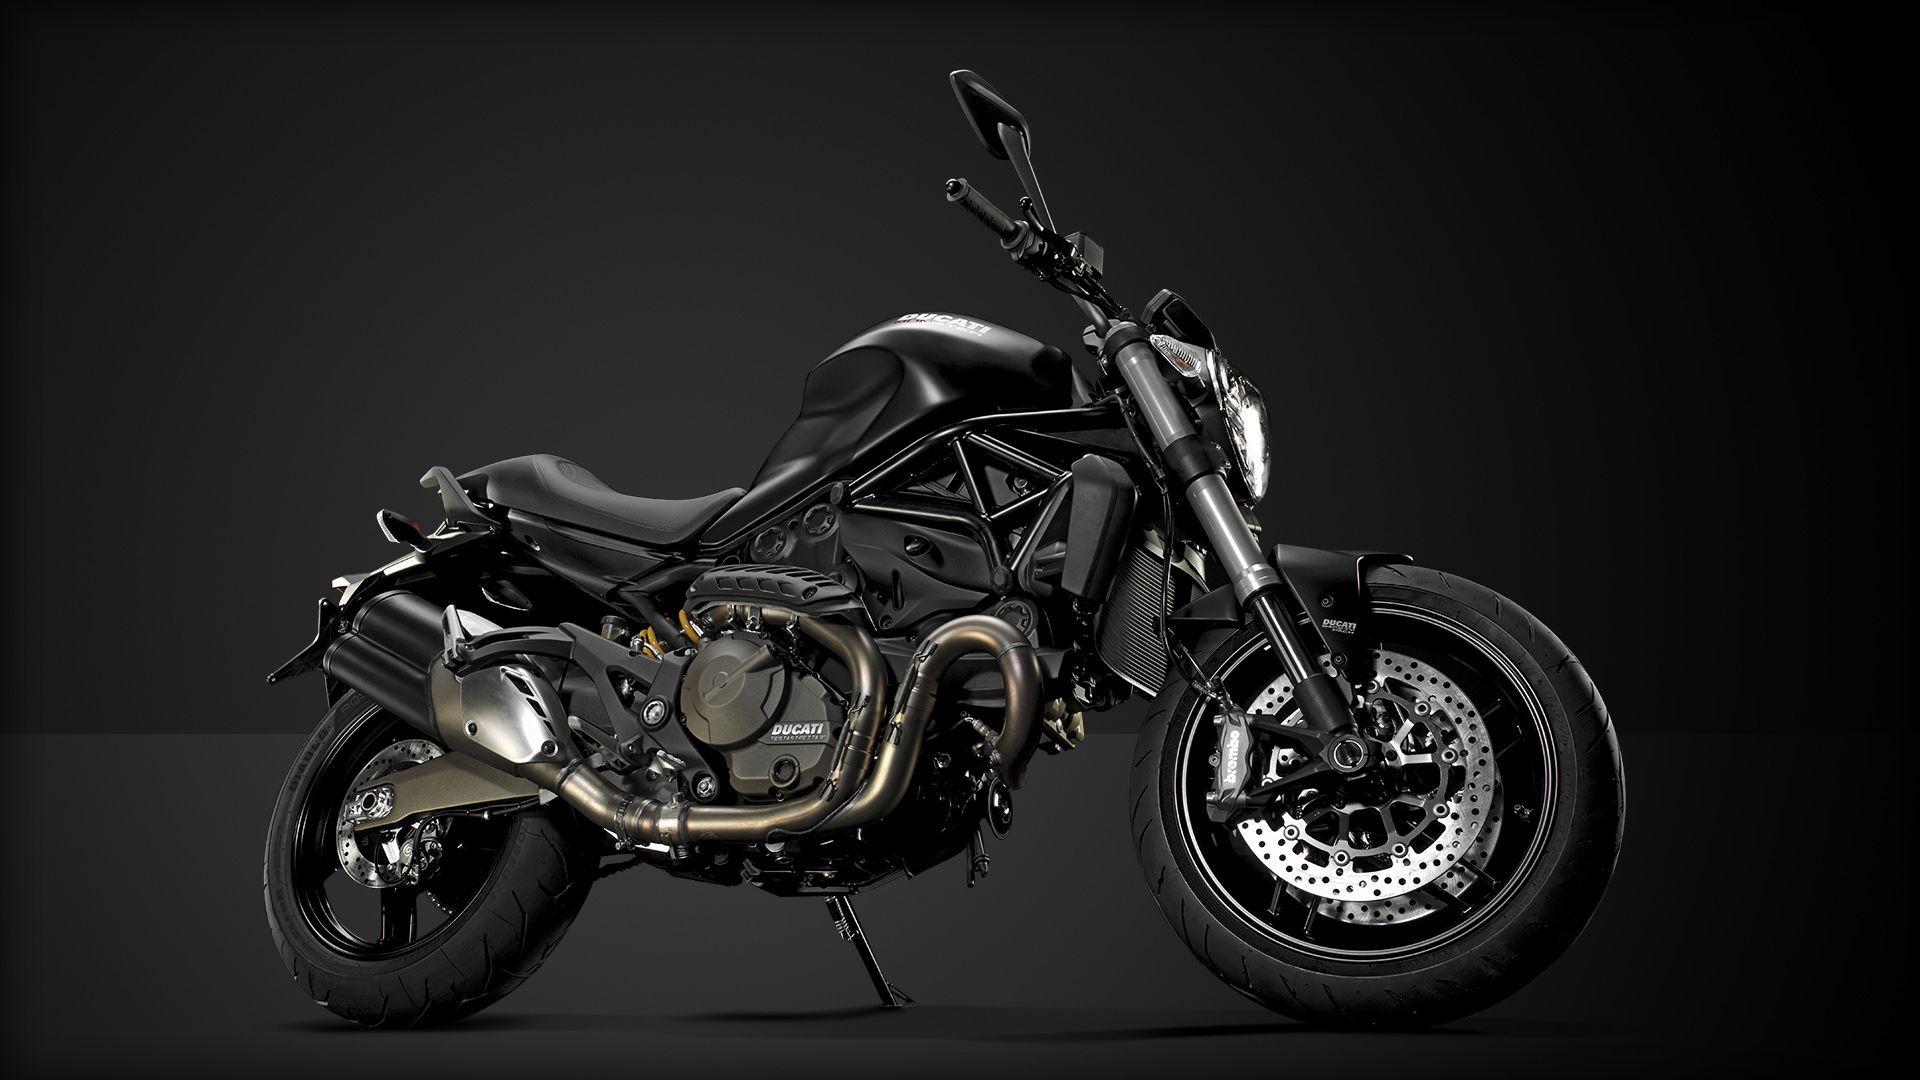 2015 Ducati MONSTER 821 DARK | Ducati Monster 821 Dark